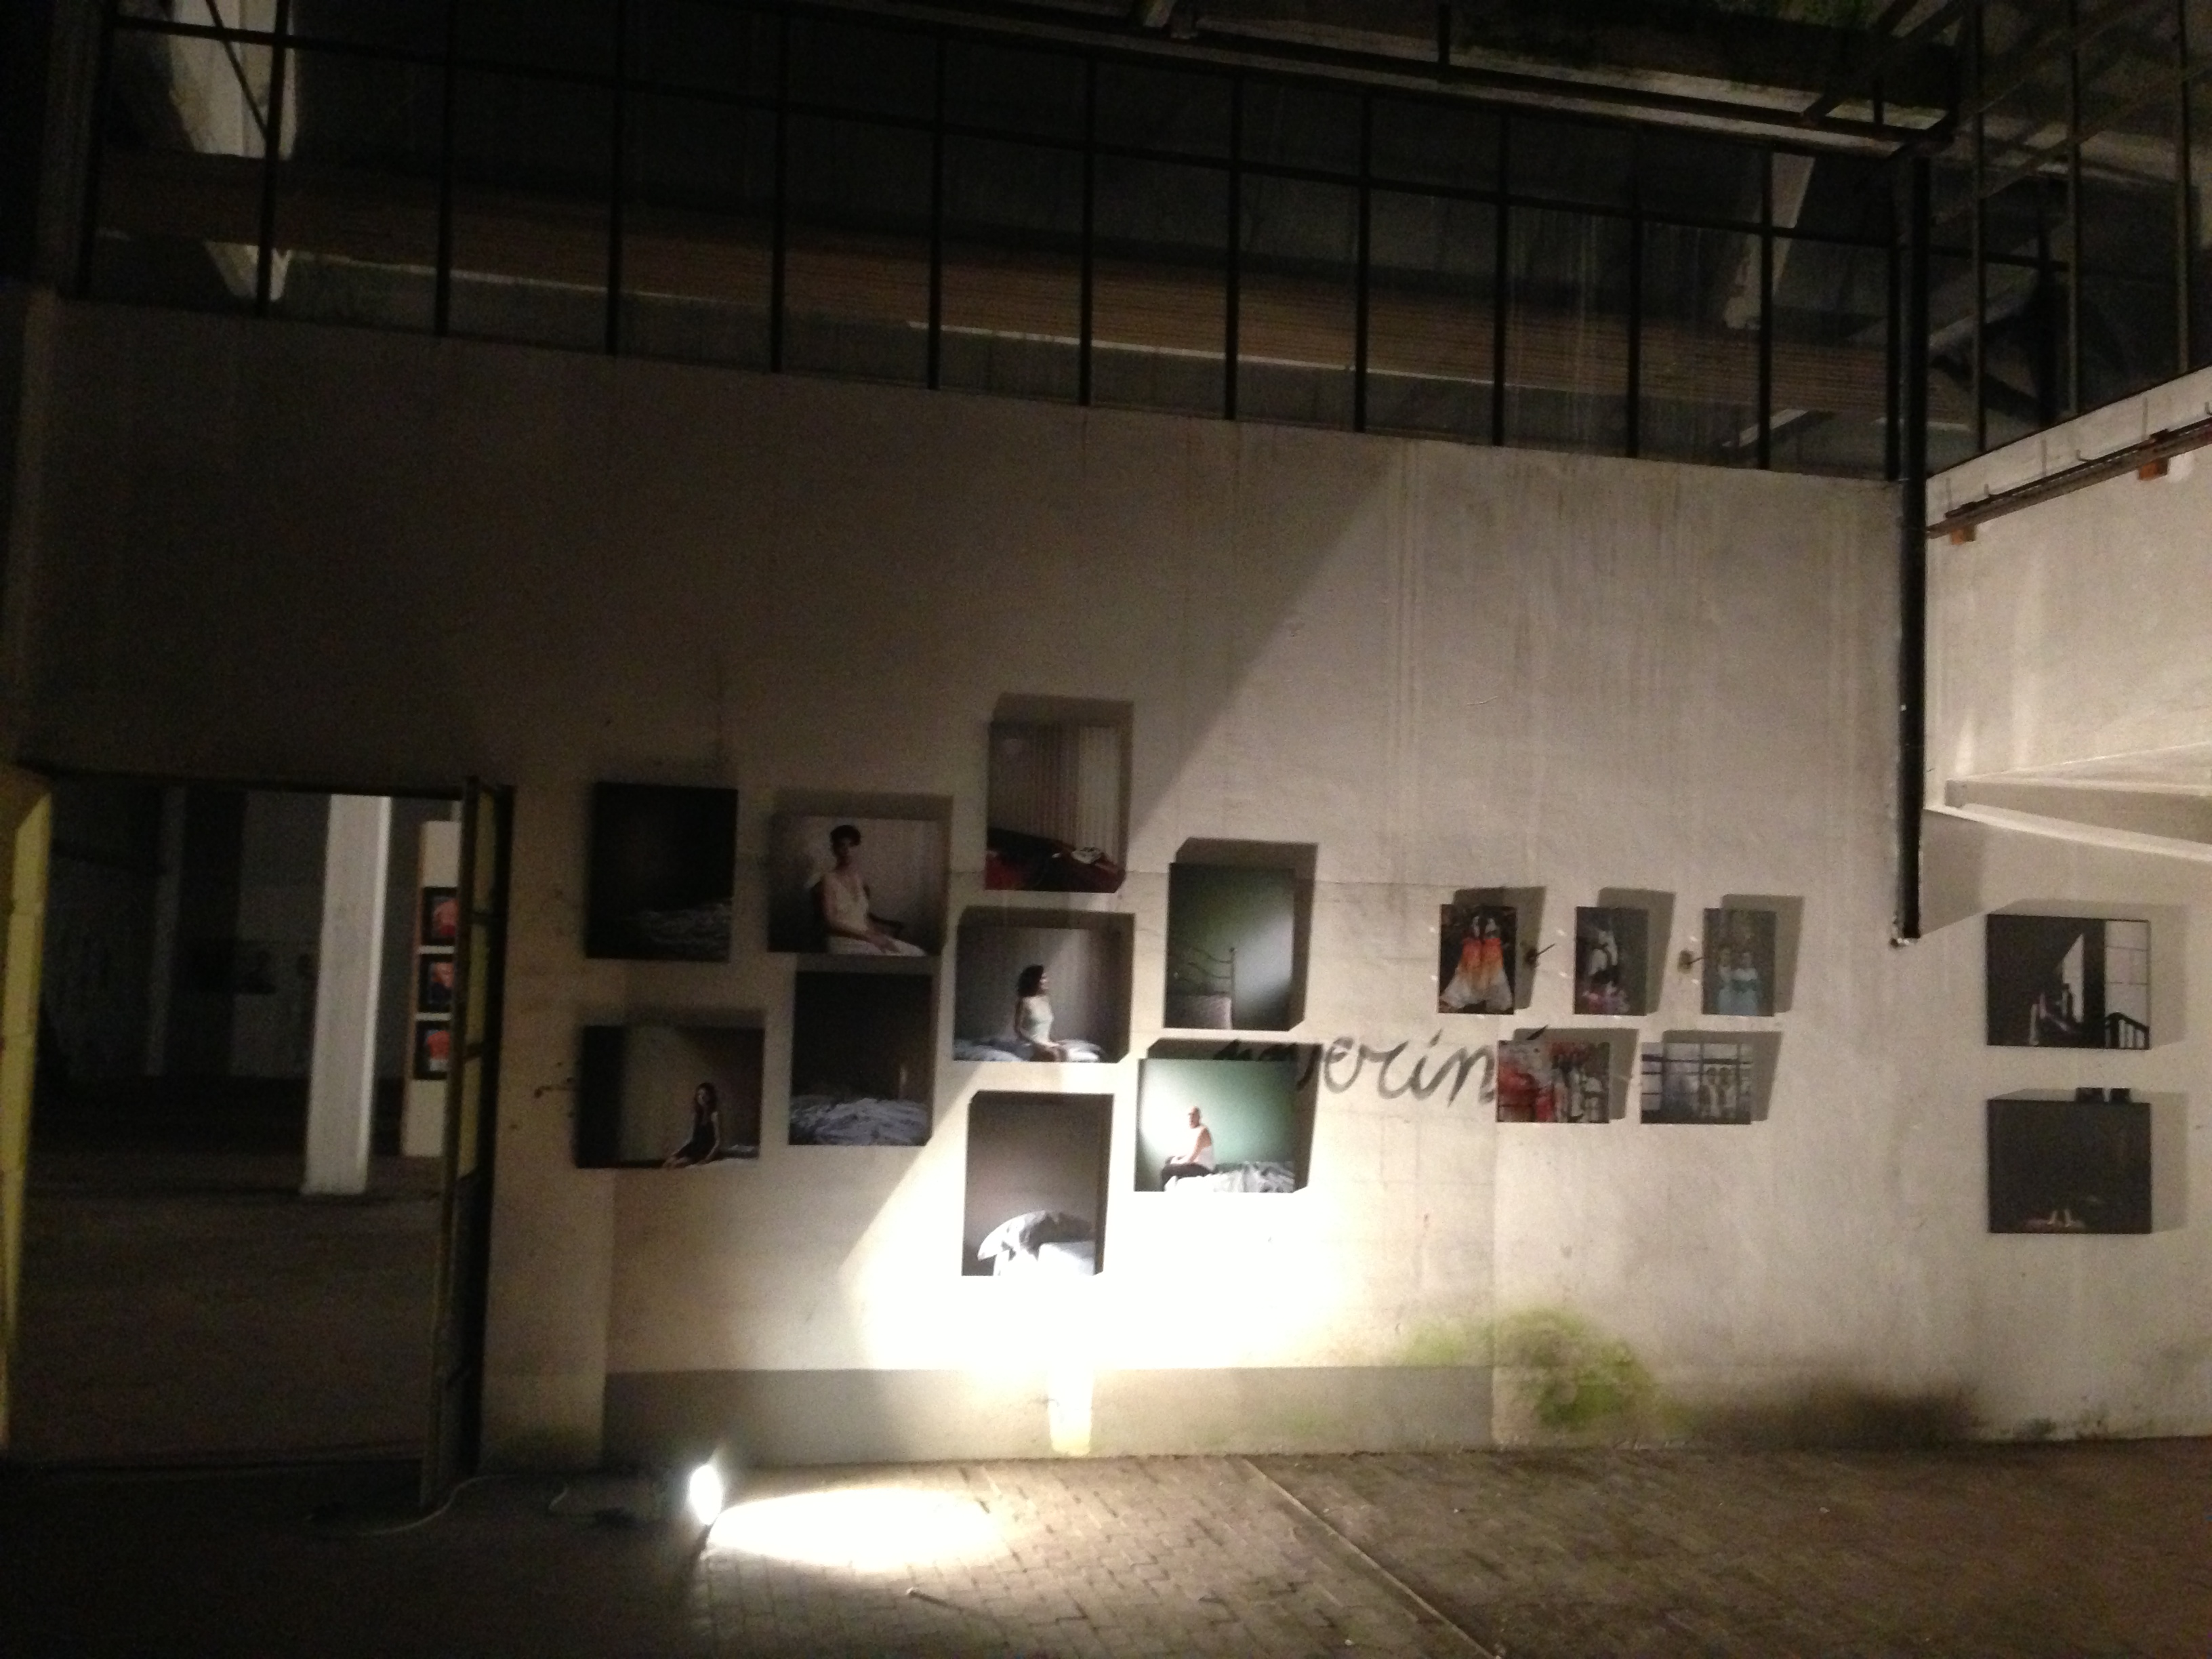 Photissima Art Fair presso Ex Manifattura Tabacchi Torino